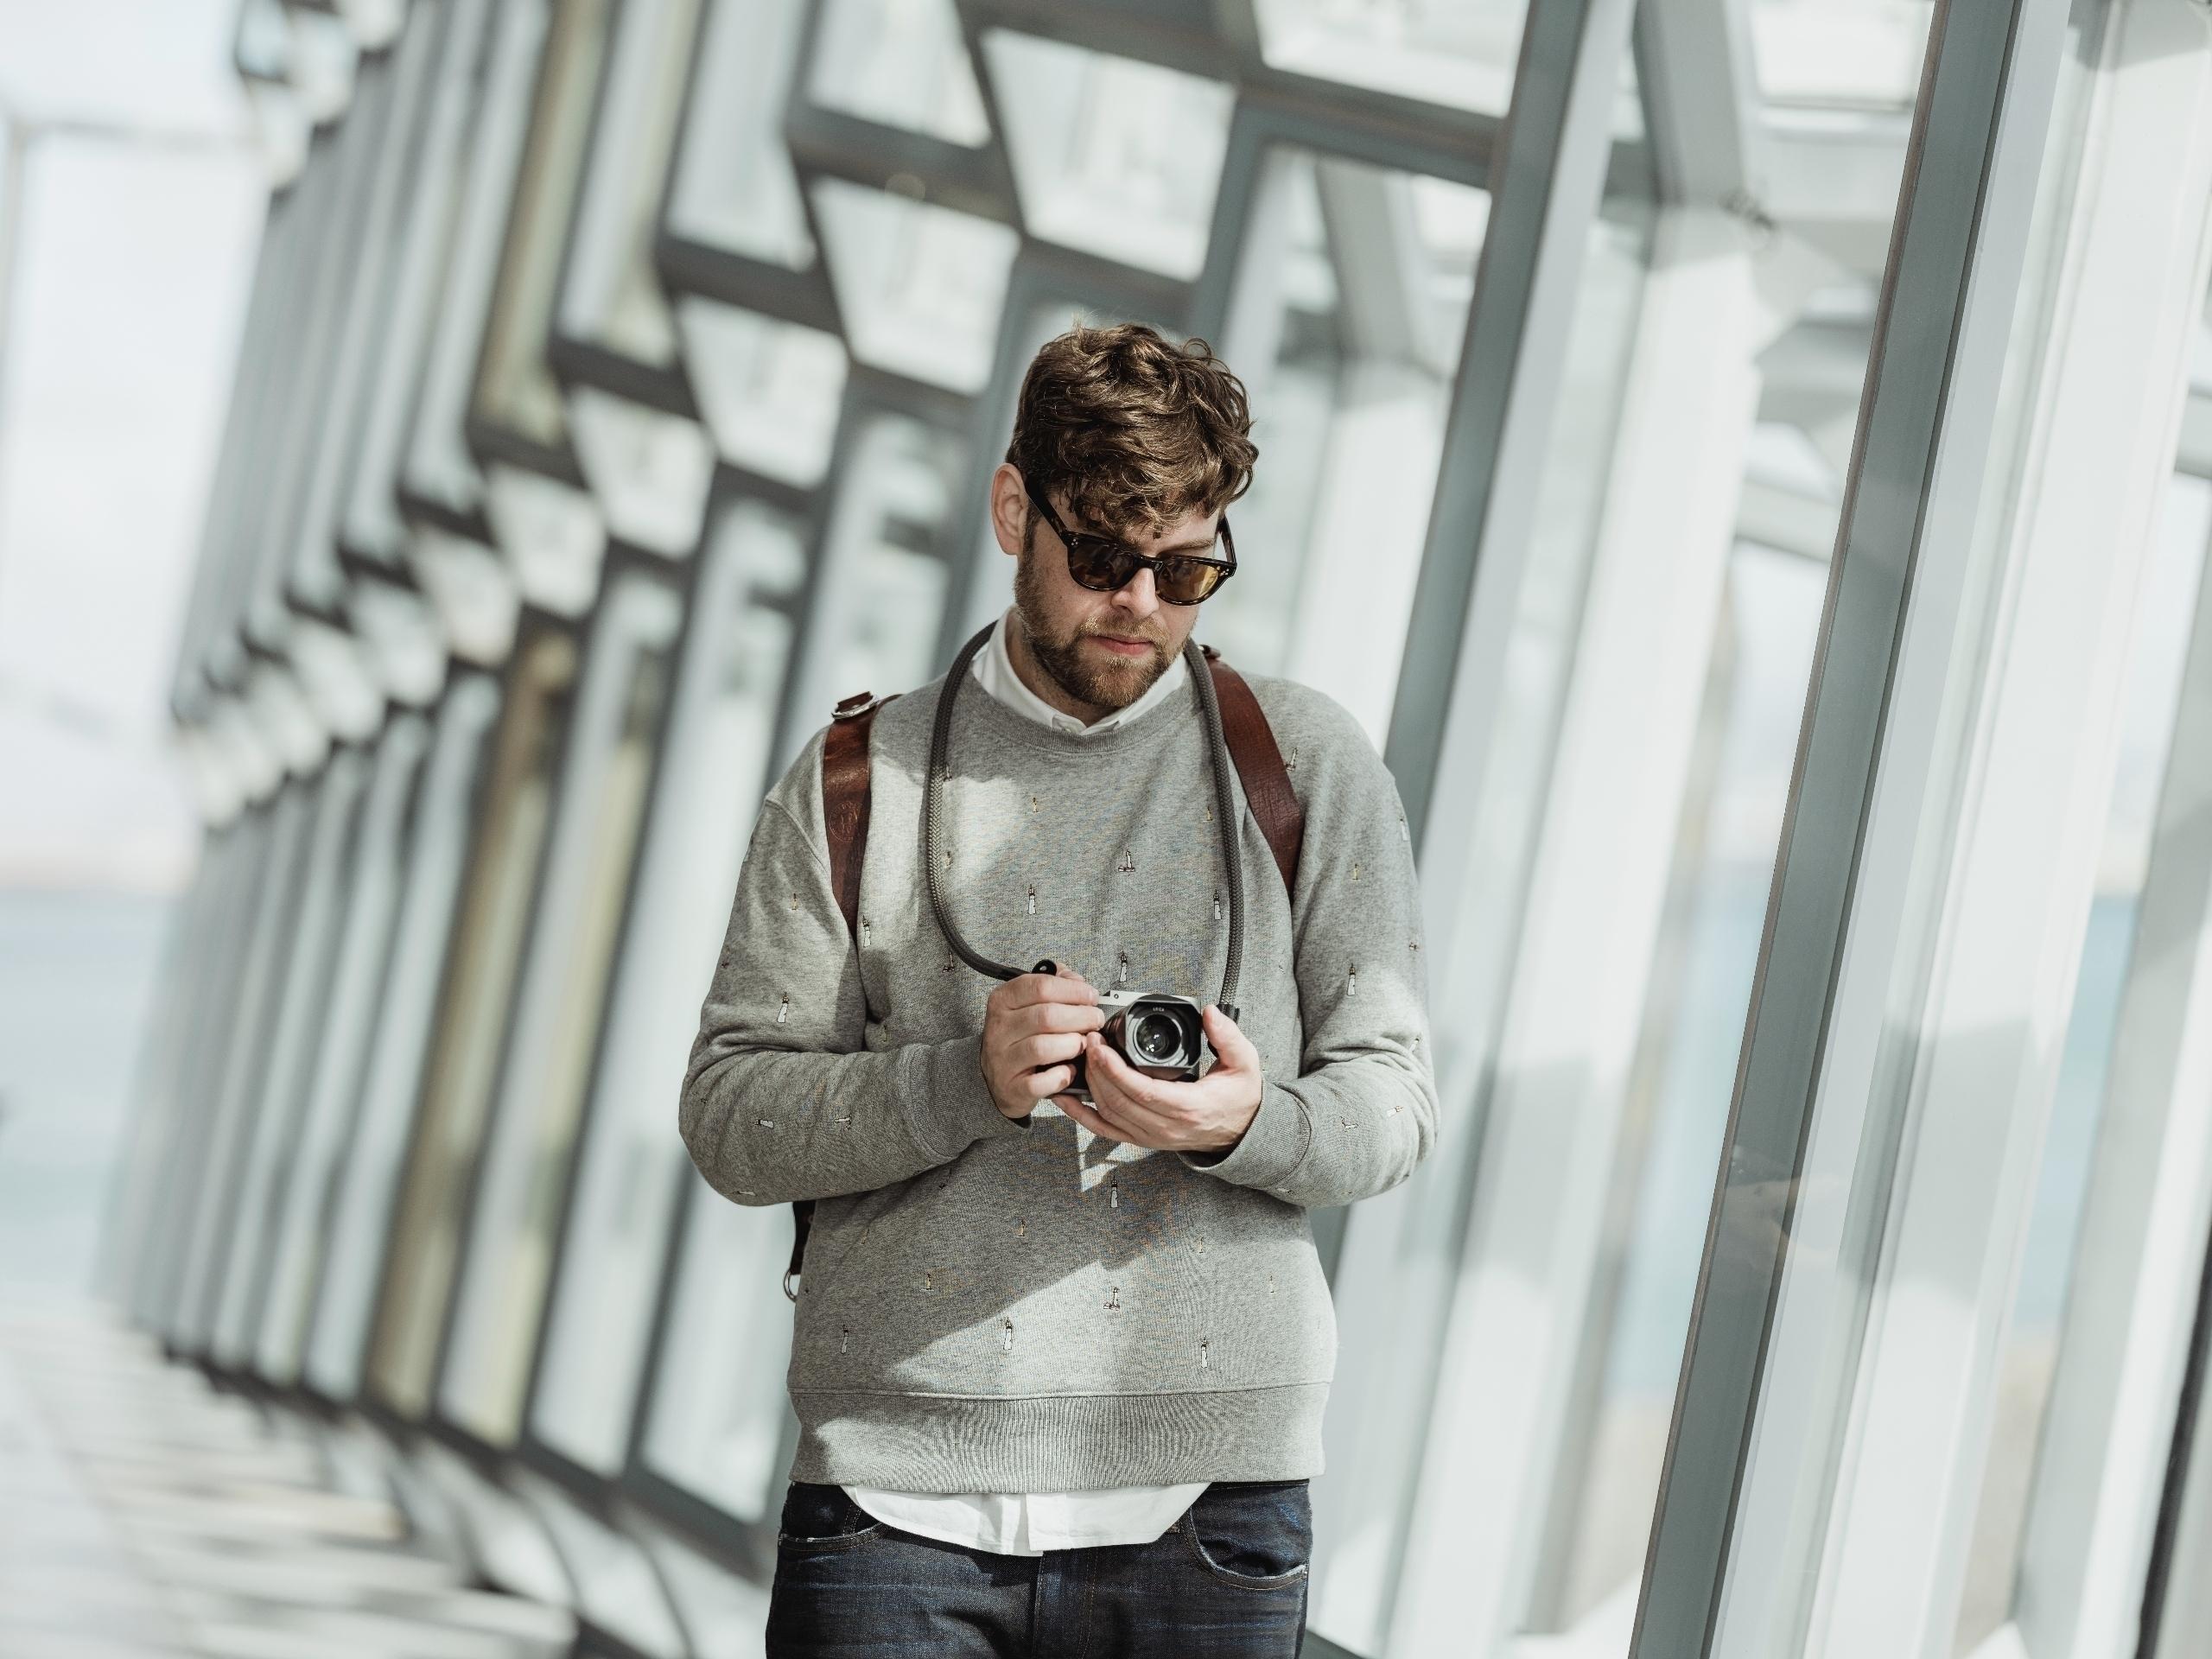 Portrait Iceland photographer - danielkrieger | ello